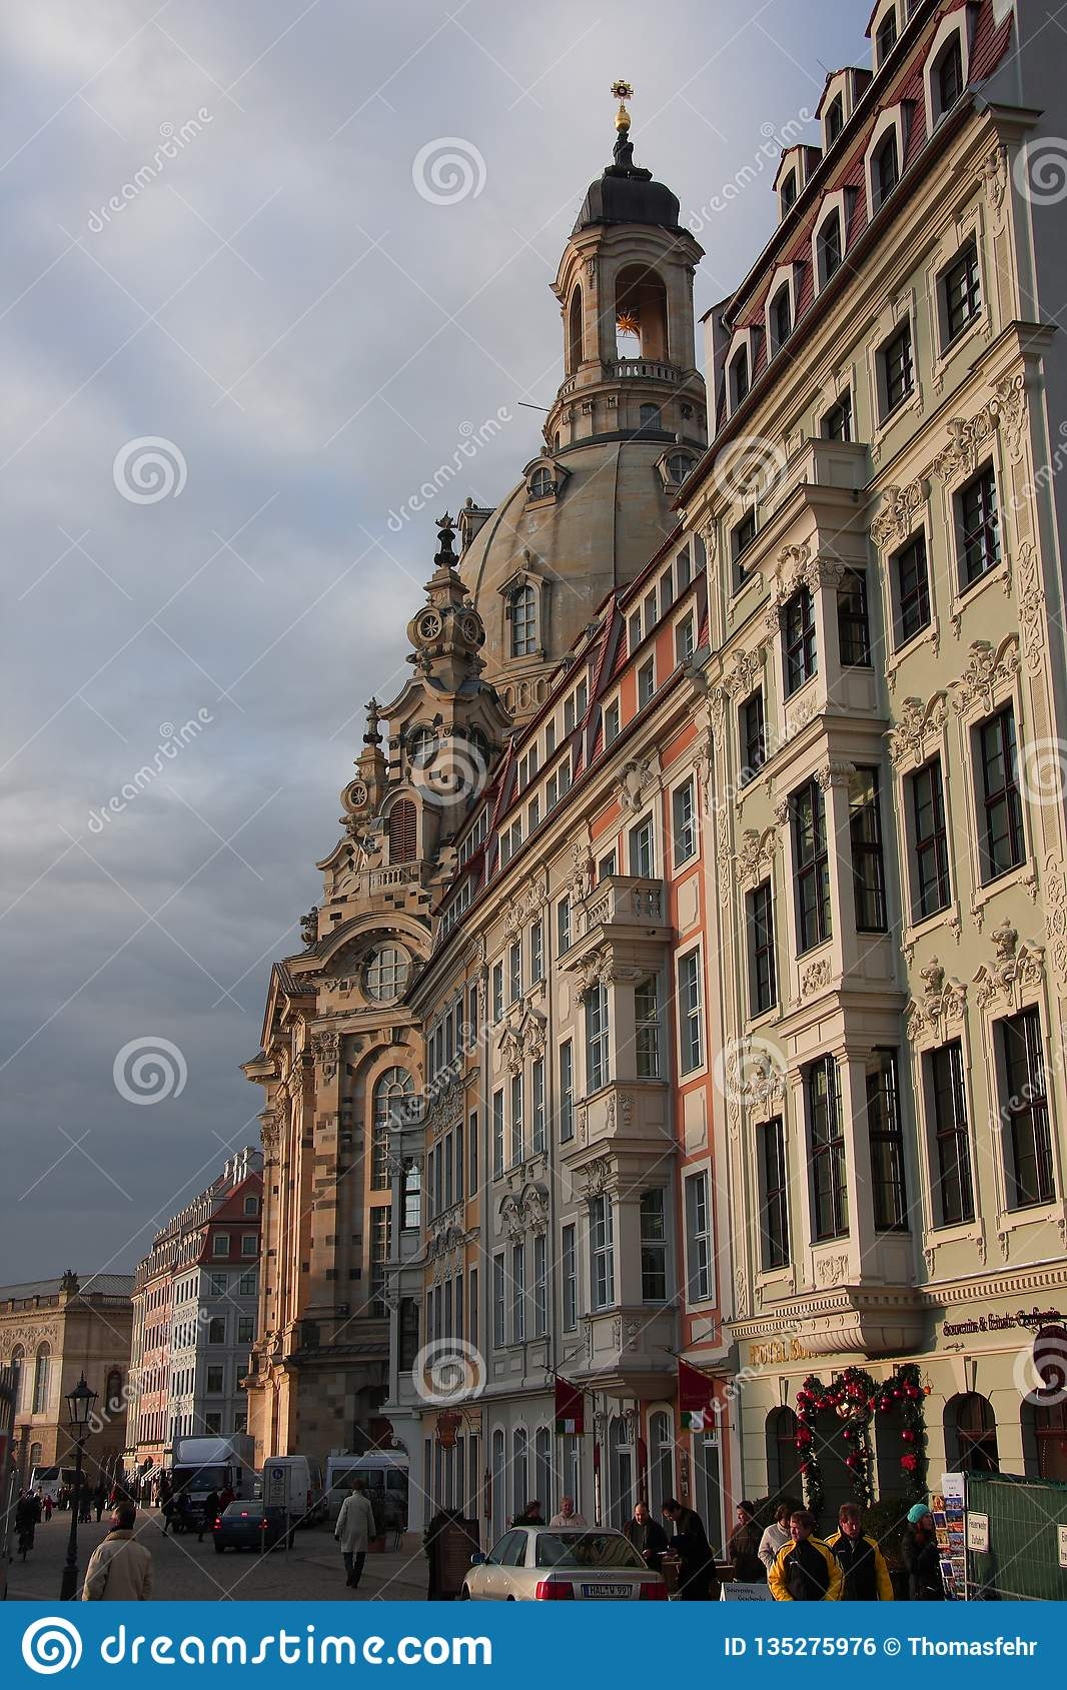 The Frauenkirche in Dresden, Saxony